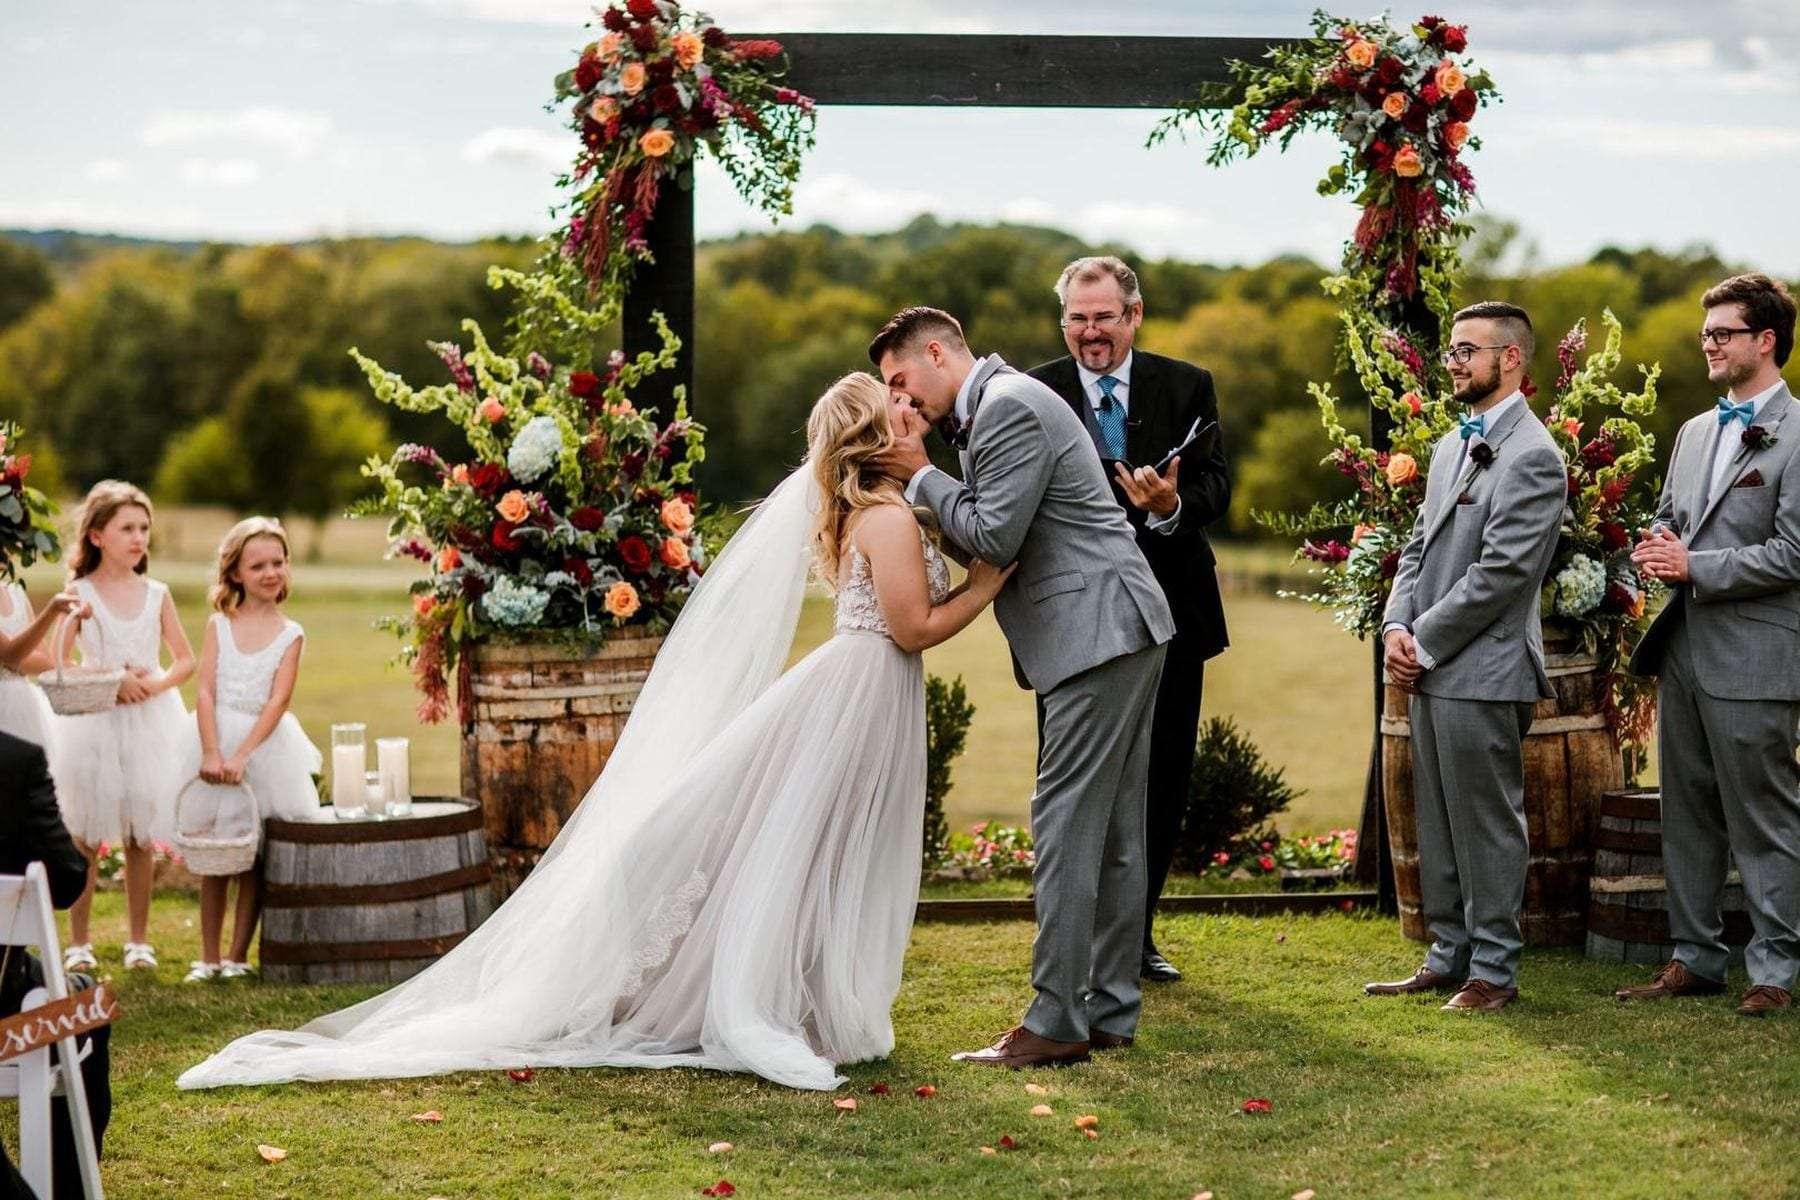 Vintage Outdoor Wedding | Allenbrooke Farms | Enchanted Florist